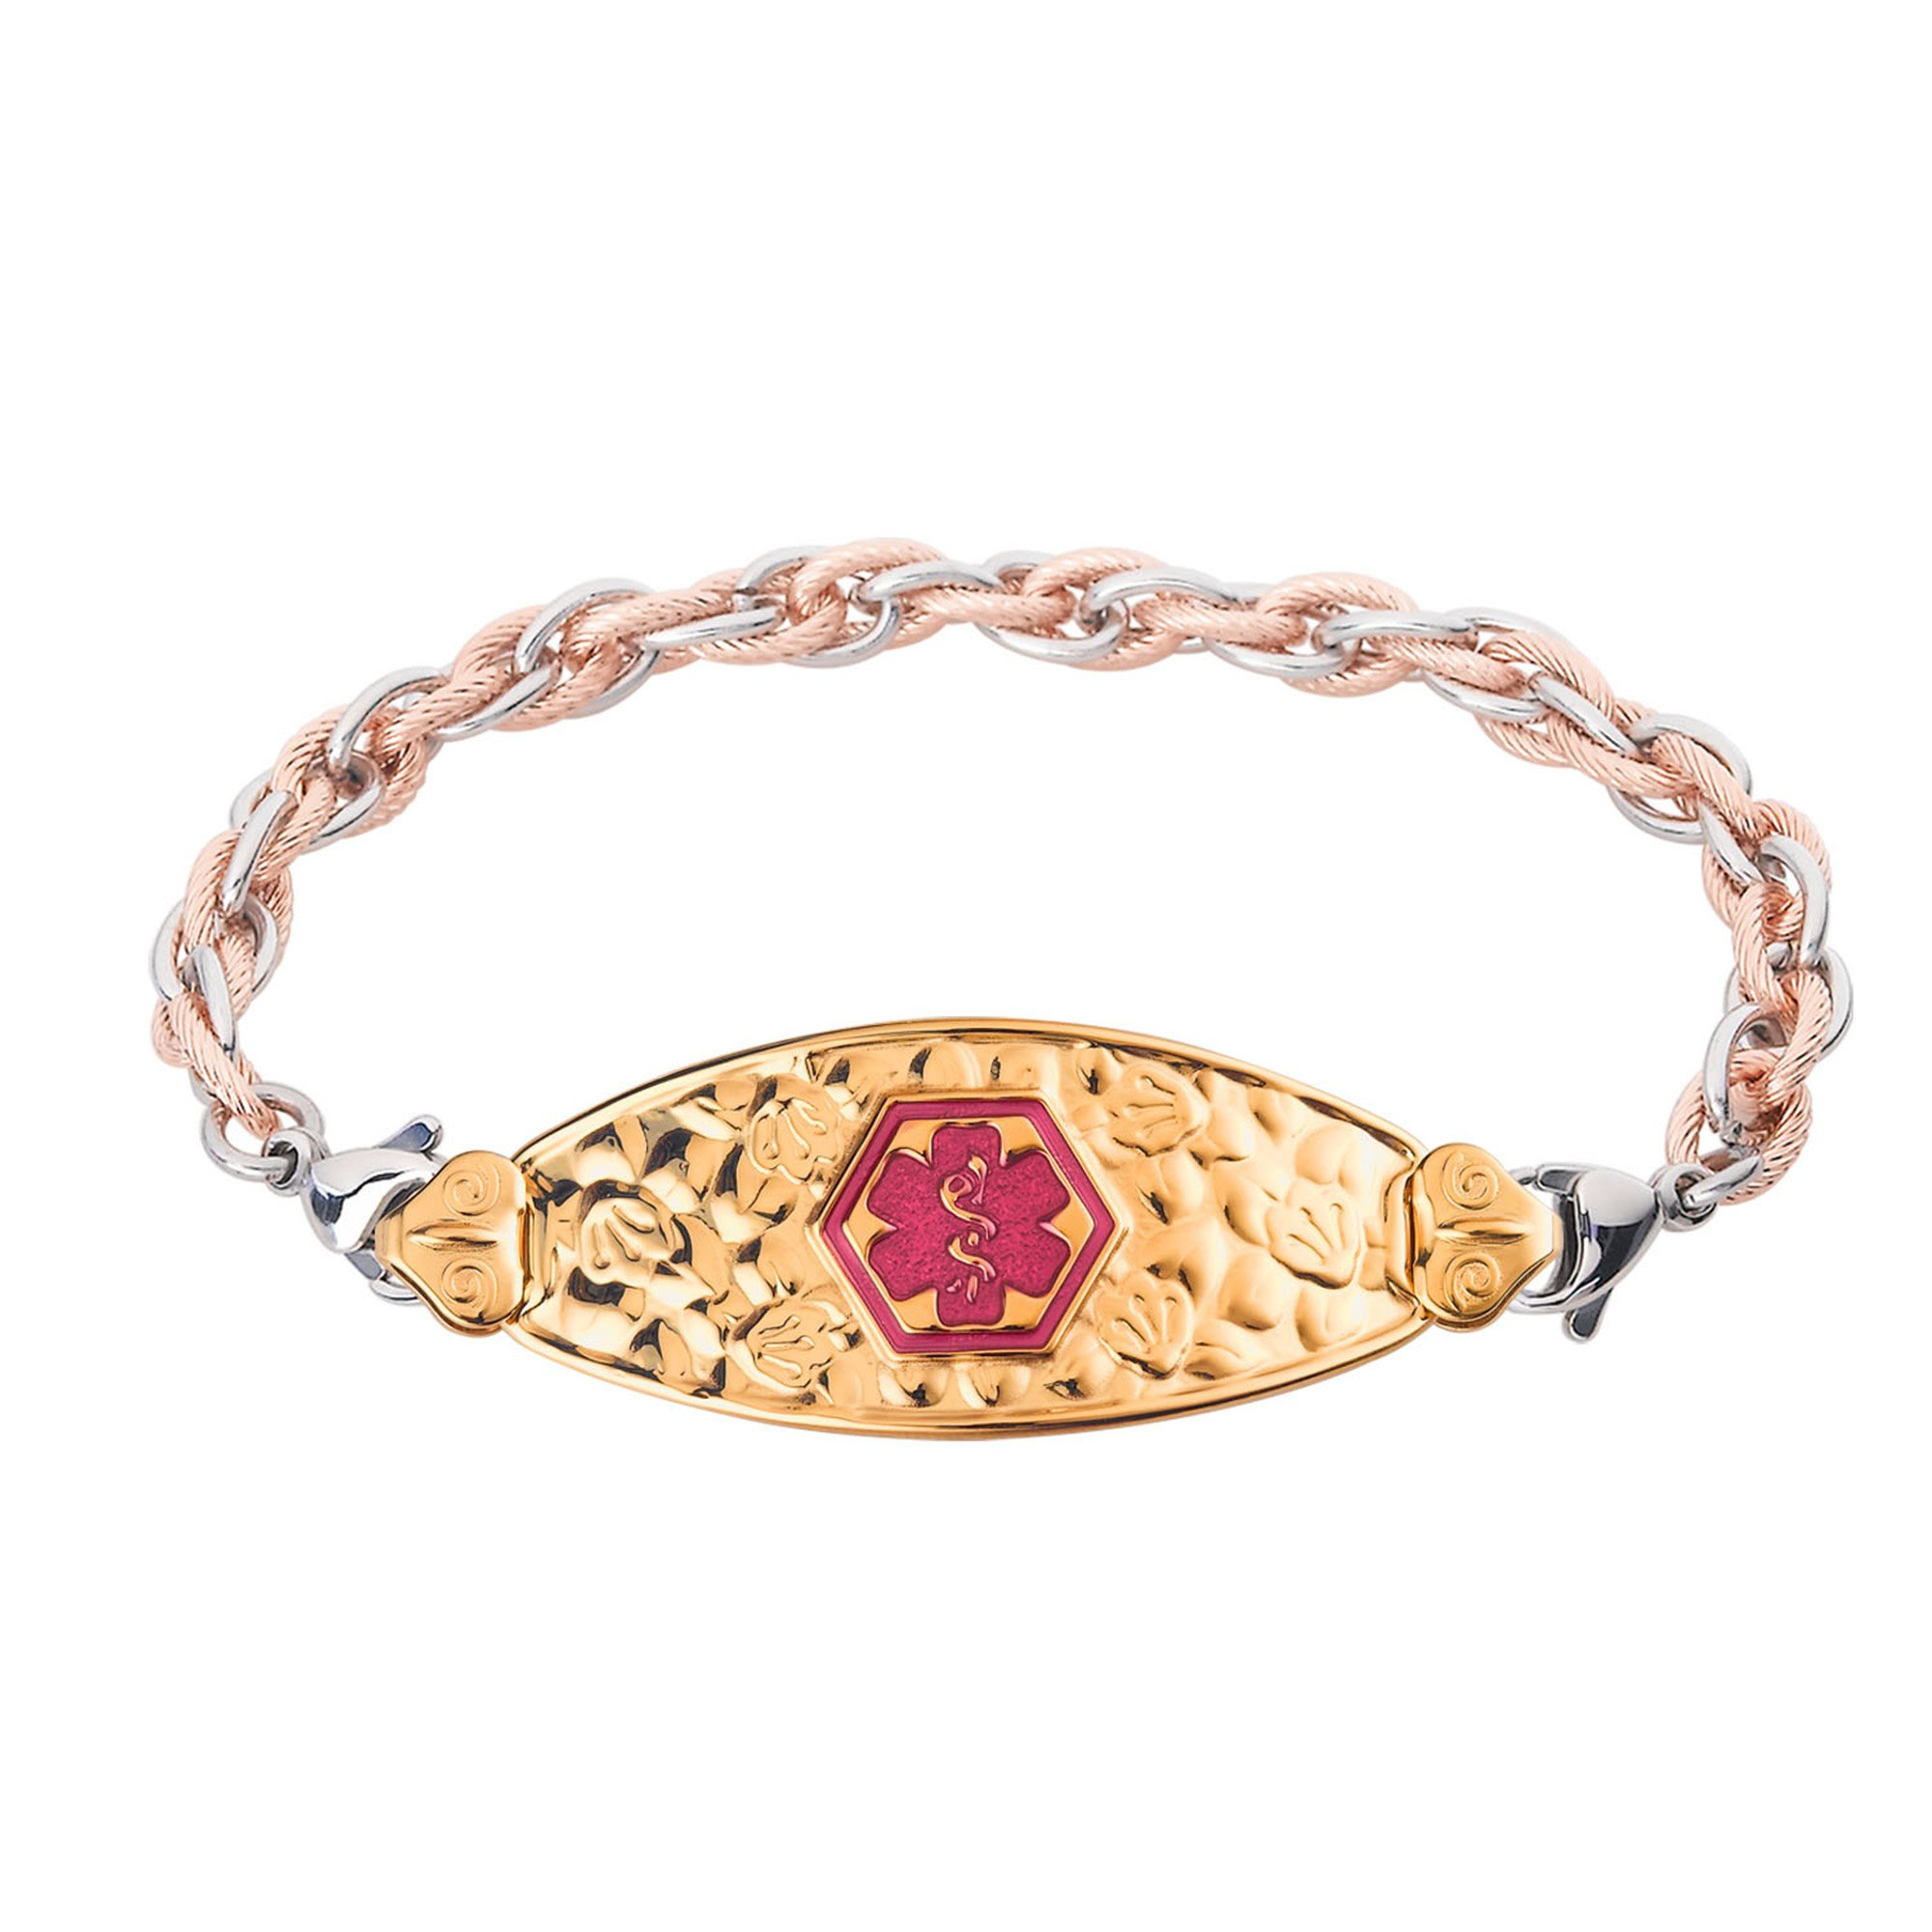 Divoti Custom Engraved PVD Gold Cherry Blossom Medical Alert Bracelet -Inter-Mesh Rose Gold/Silver-TP Magenta-6.0''